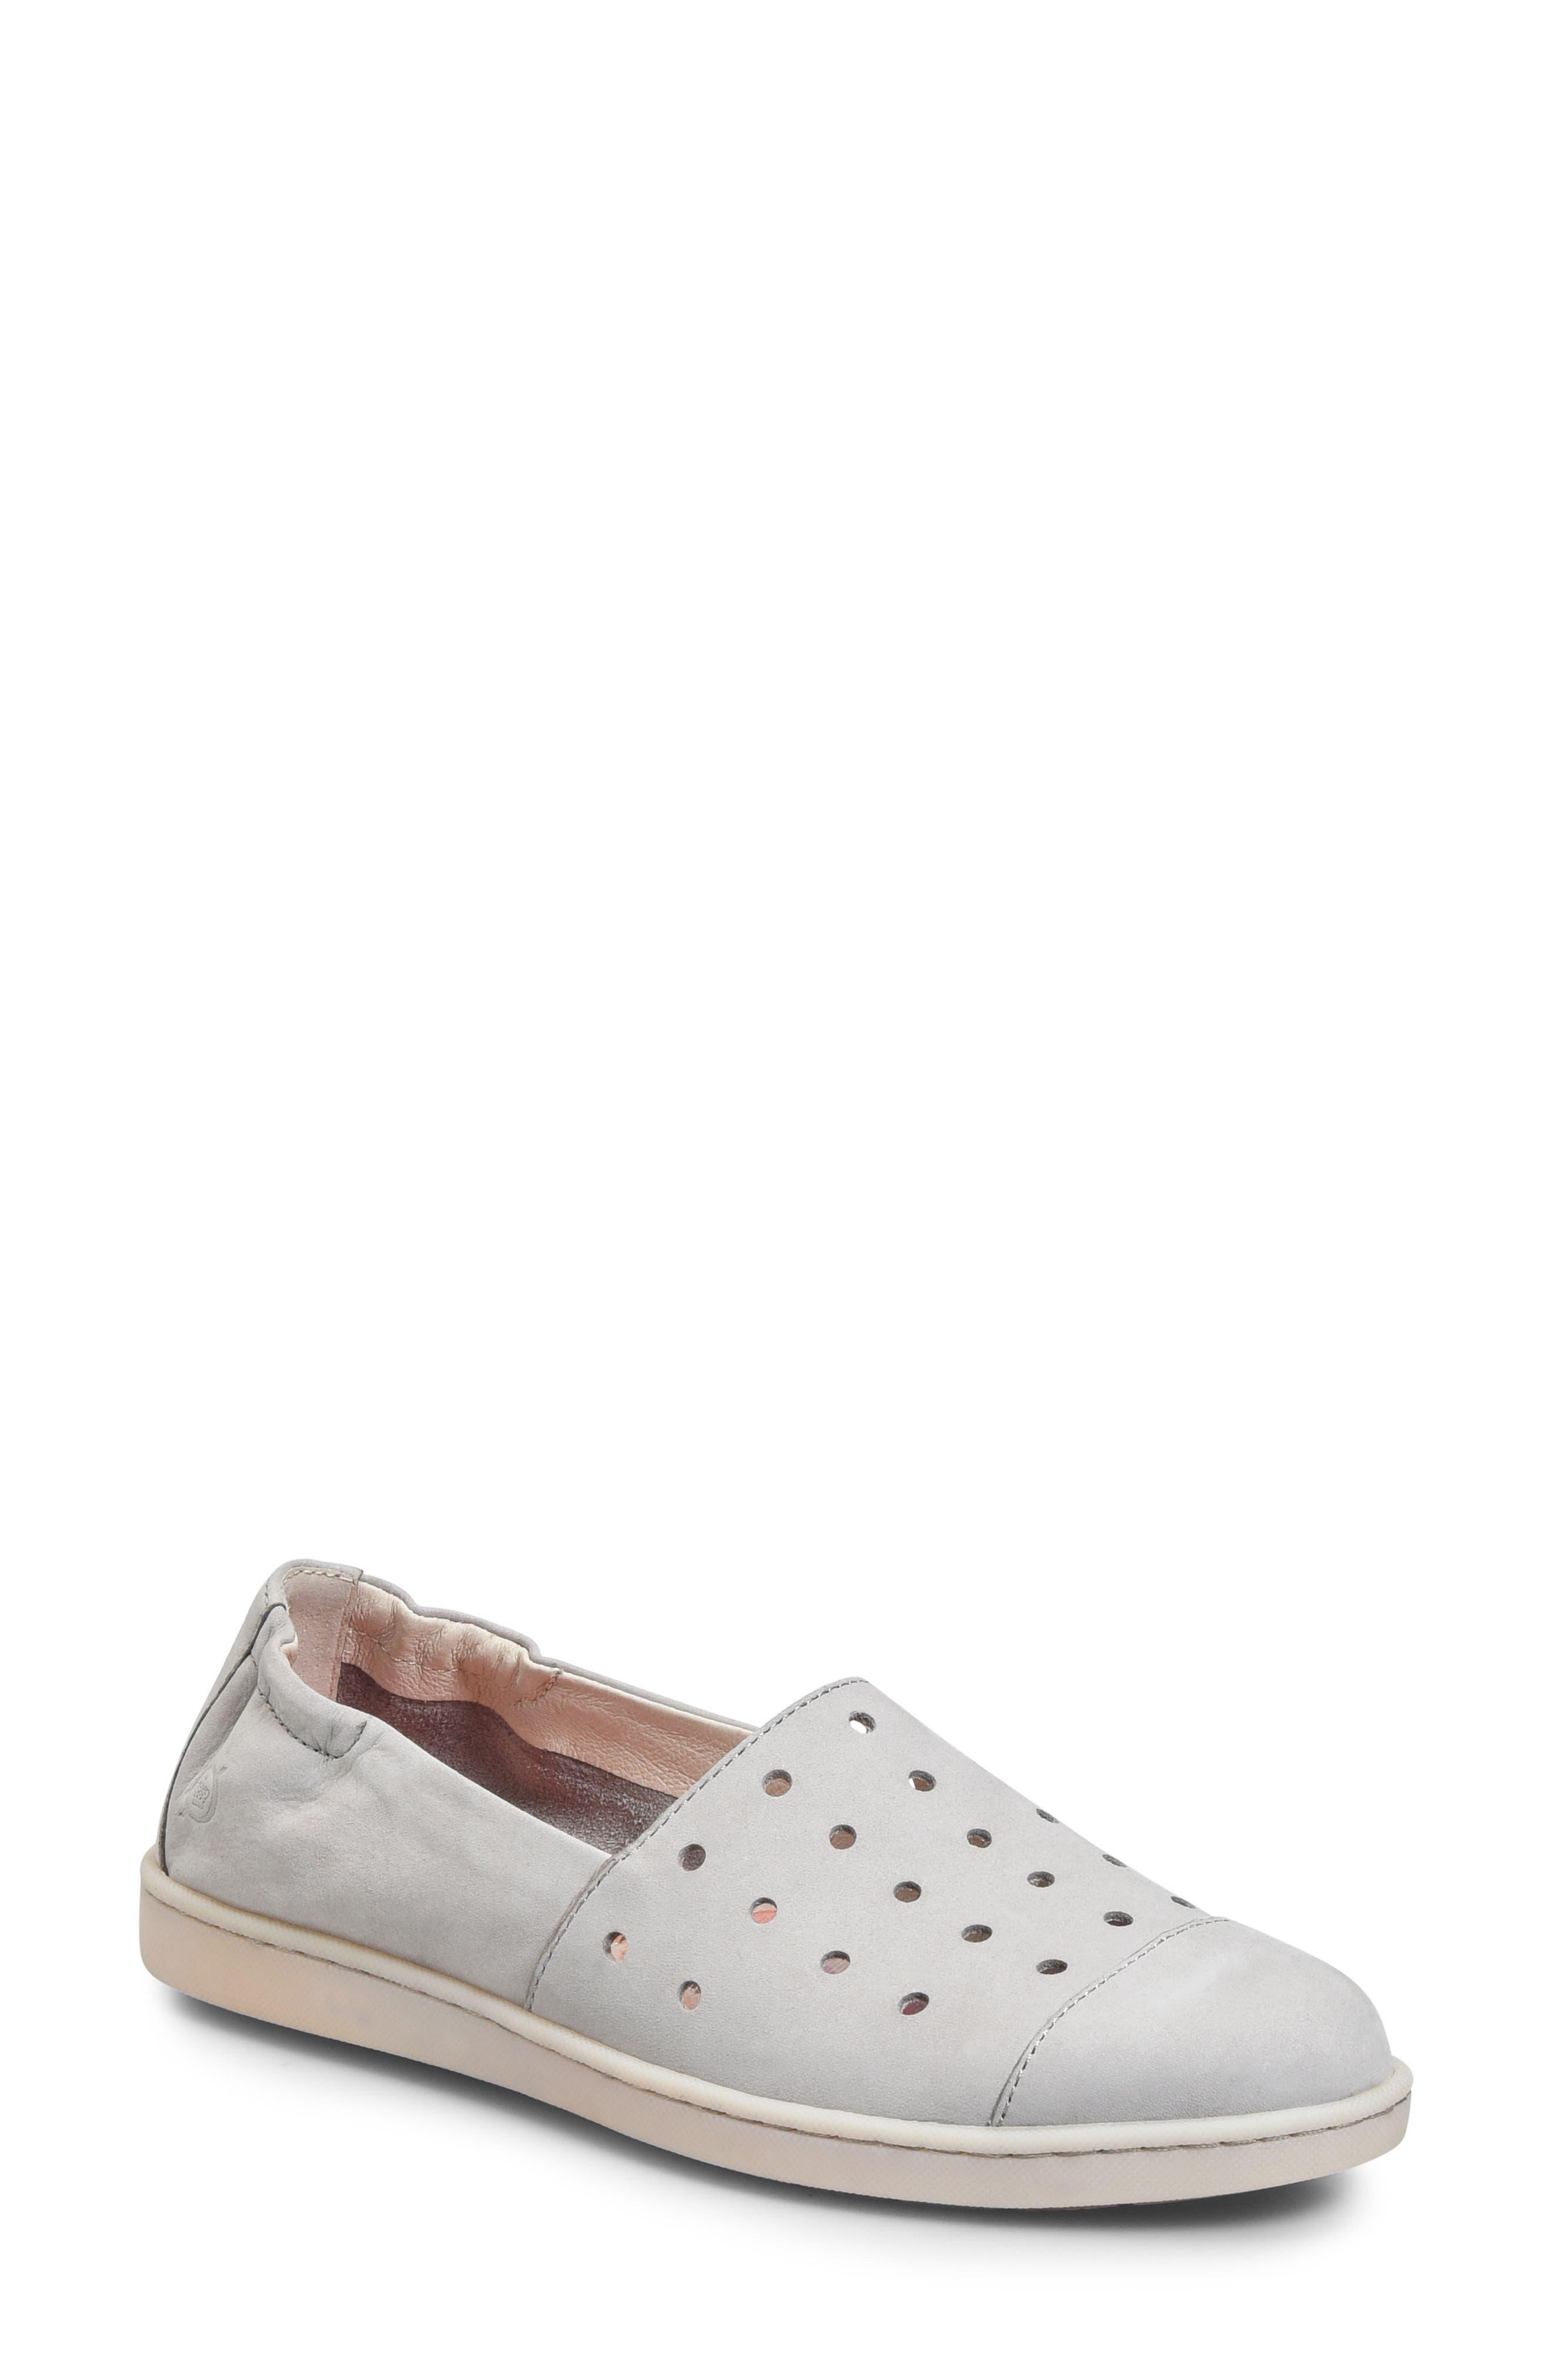 Kristin Sneaker,                         Main,                         color, Light Grey Nubuck Leather